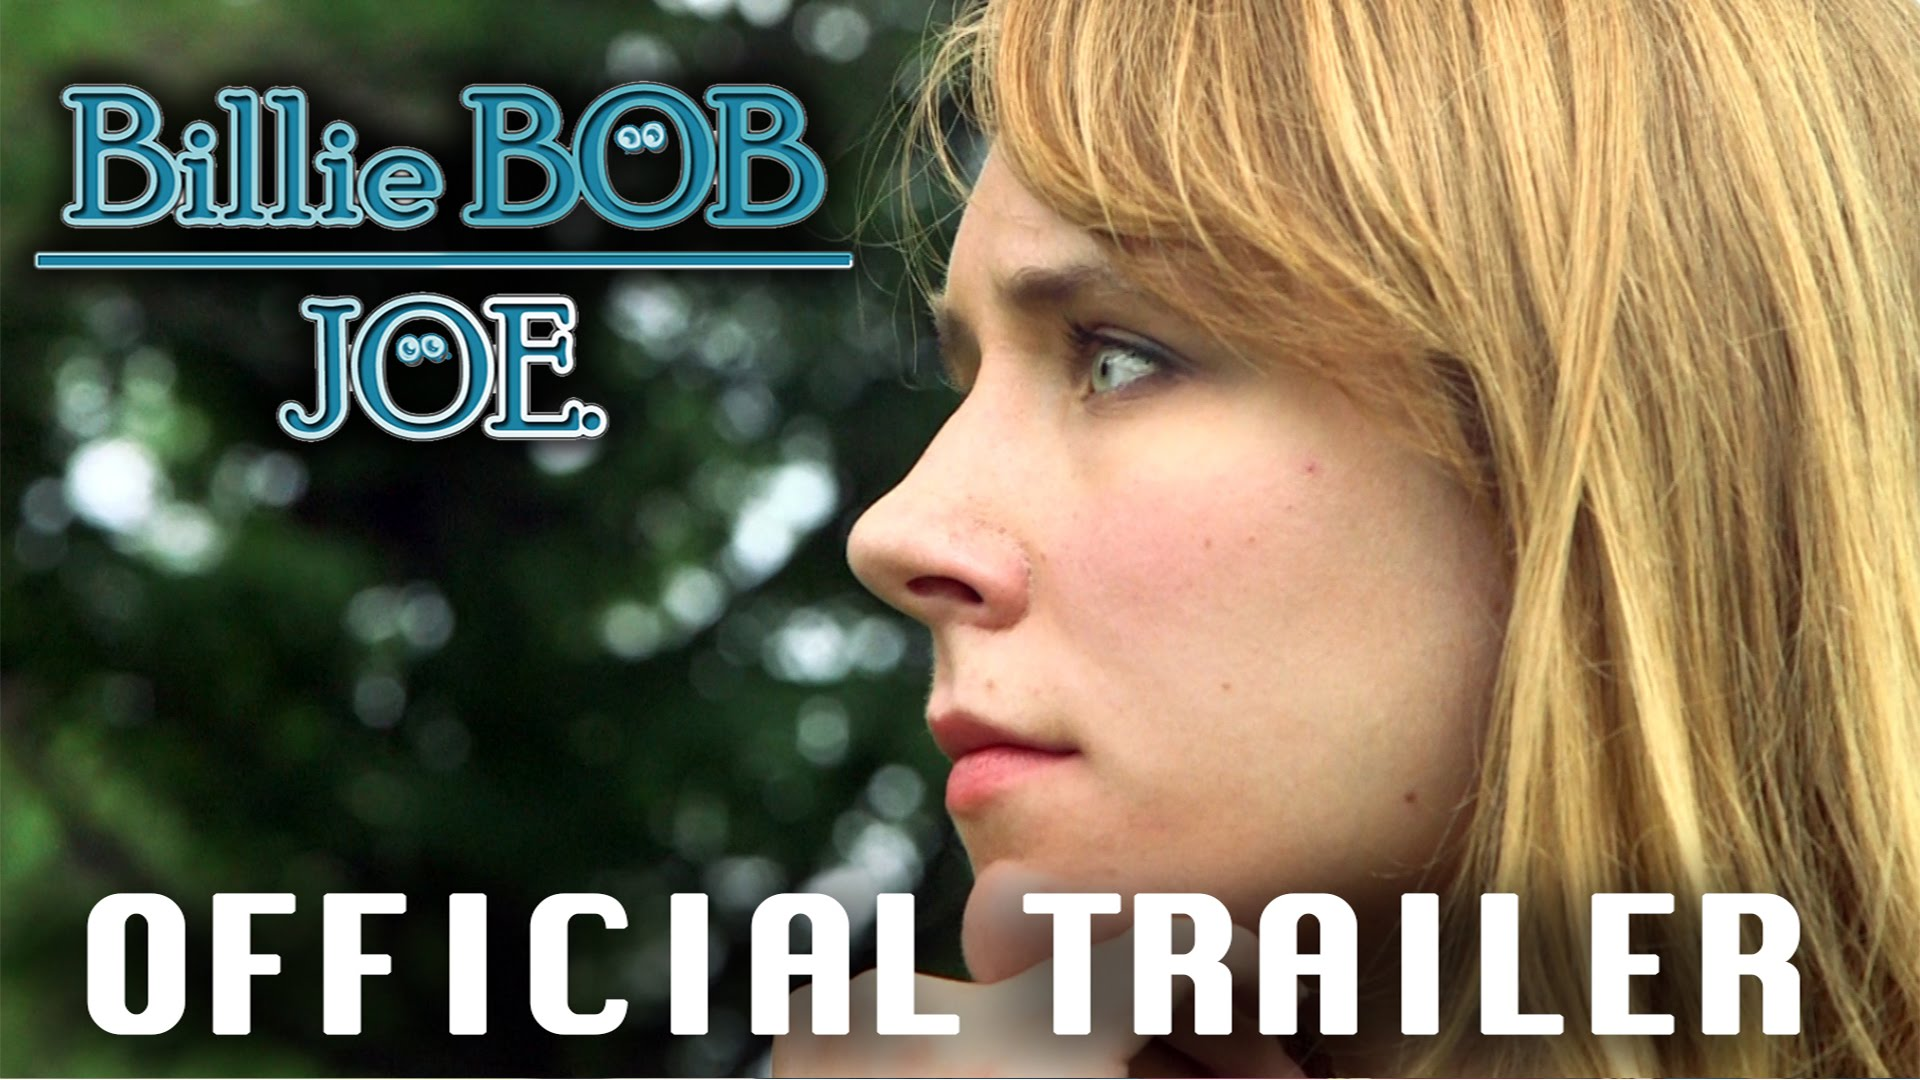 BILLIE BOB JOE  | Official Trailer (2015)